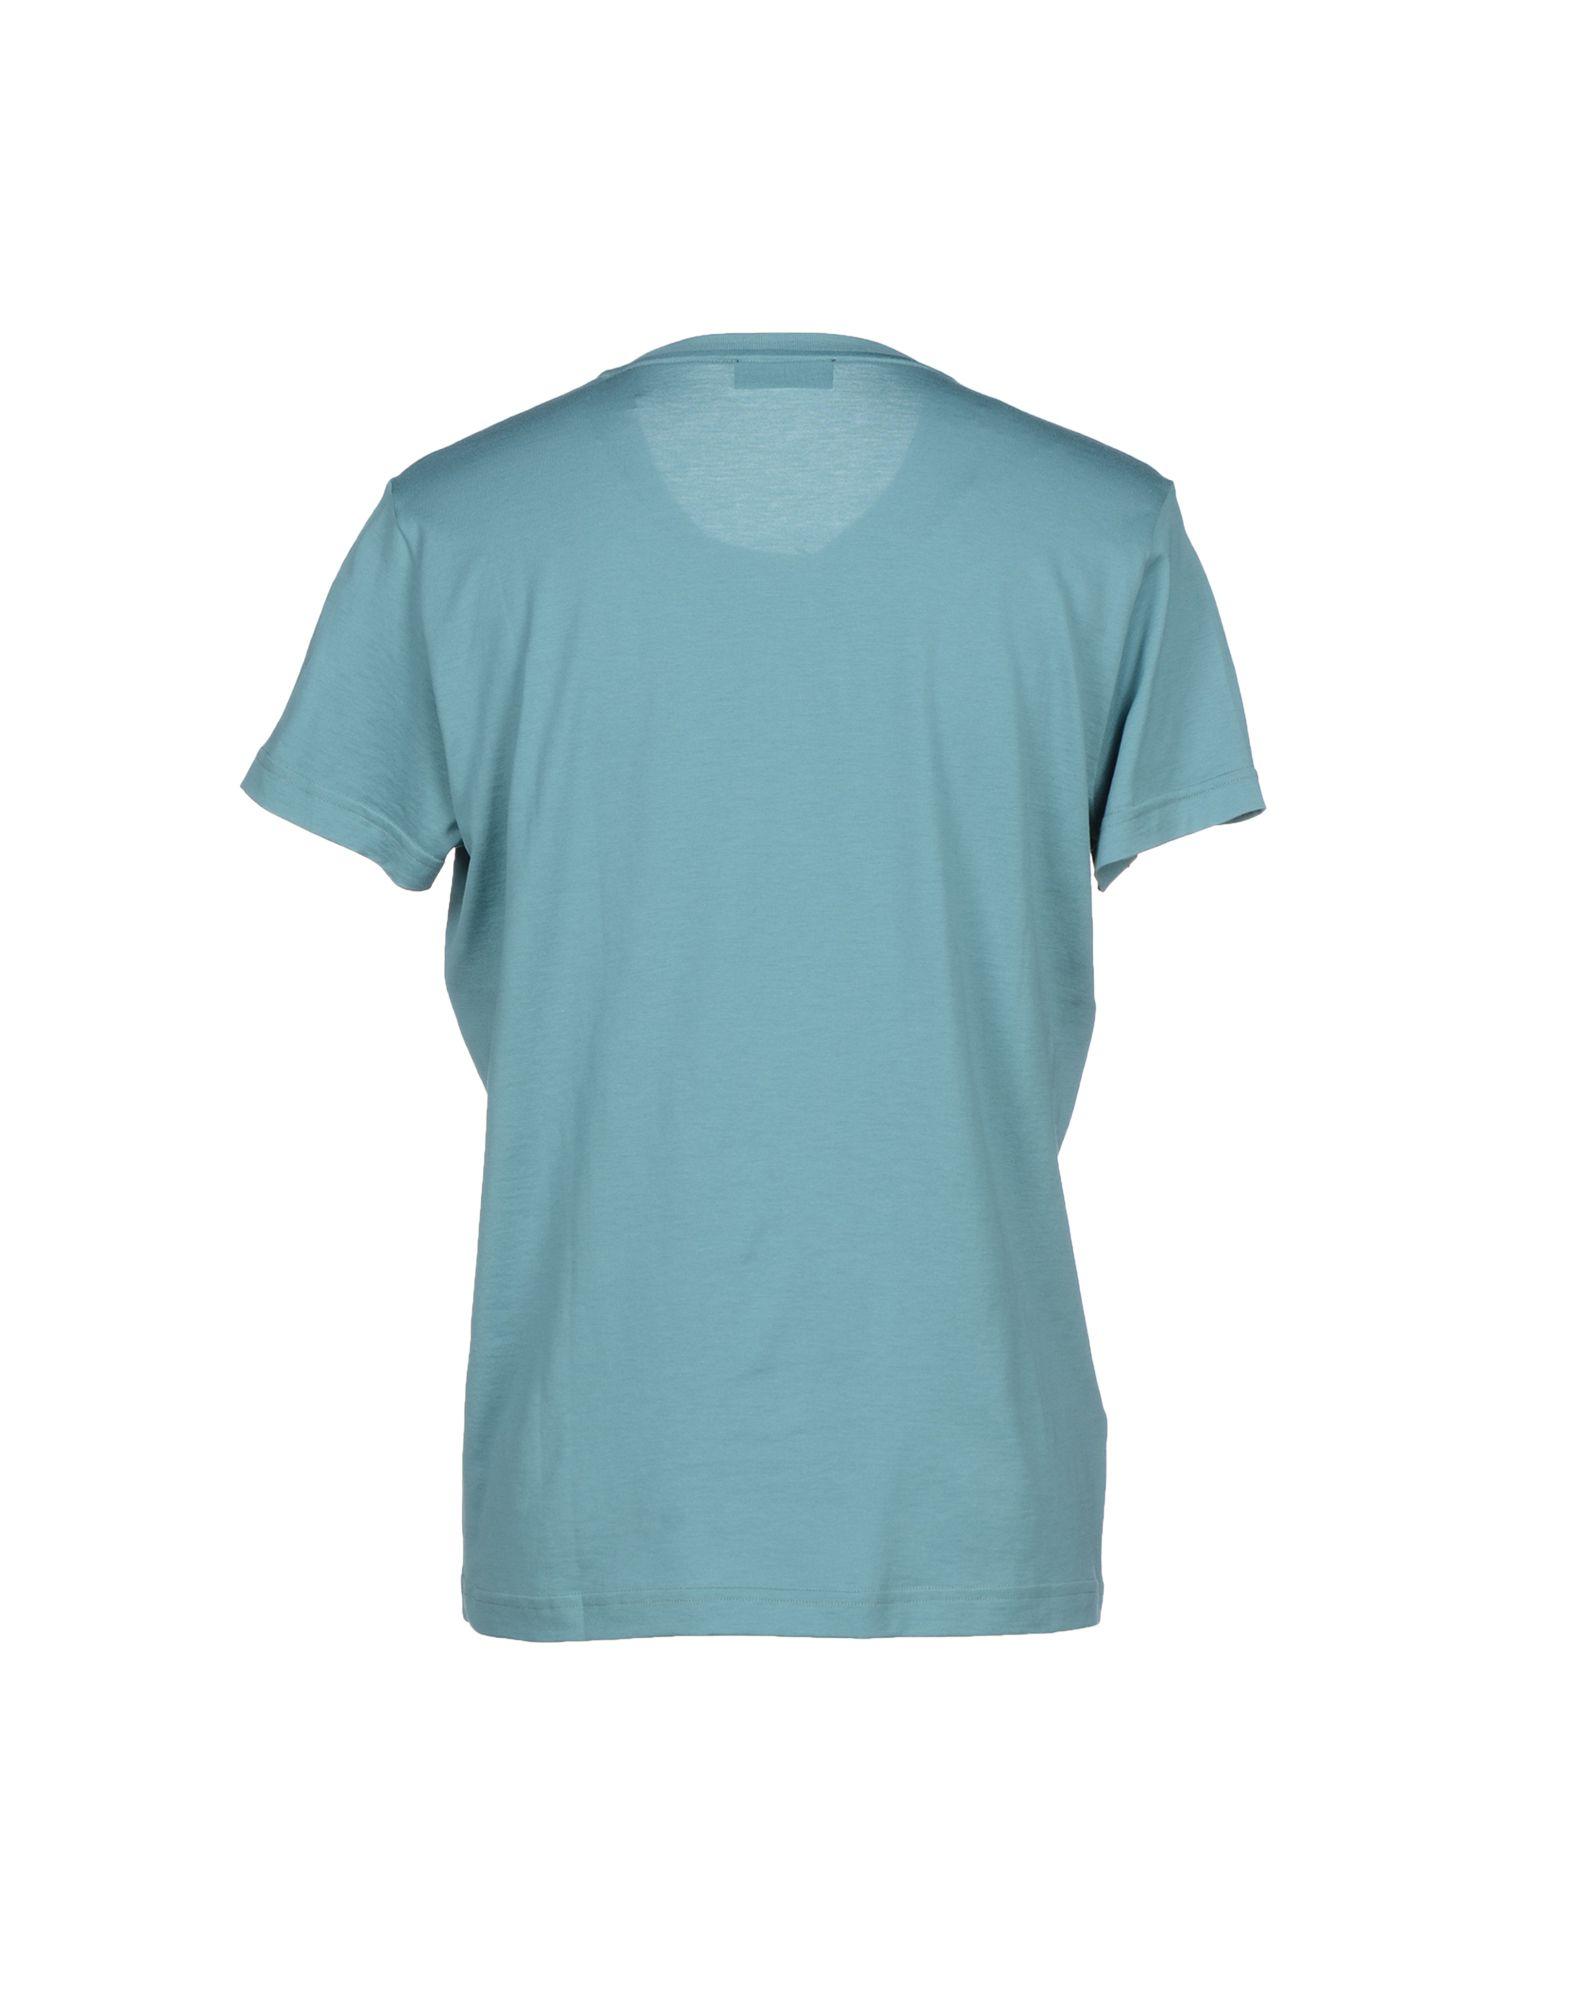 Lyst richmond x t shirt in blue for men for Richmond t shirt printing